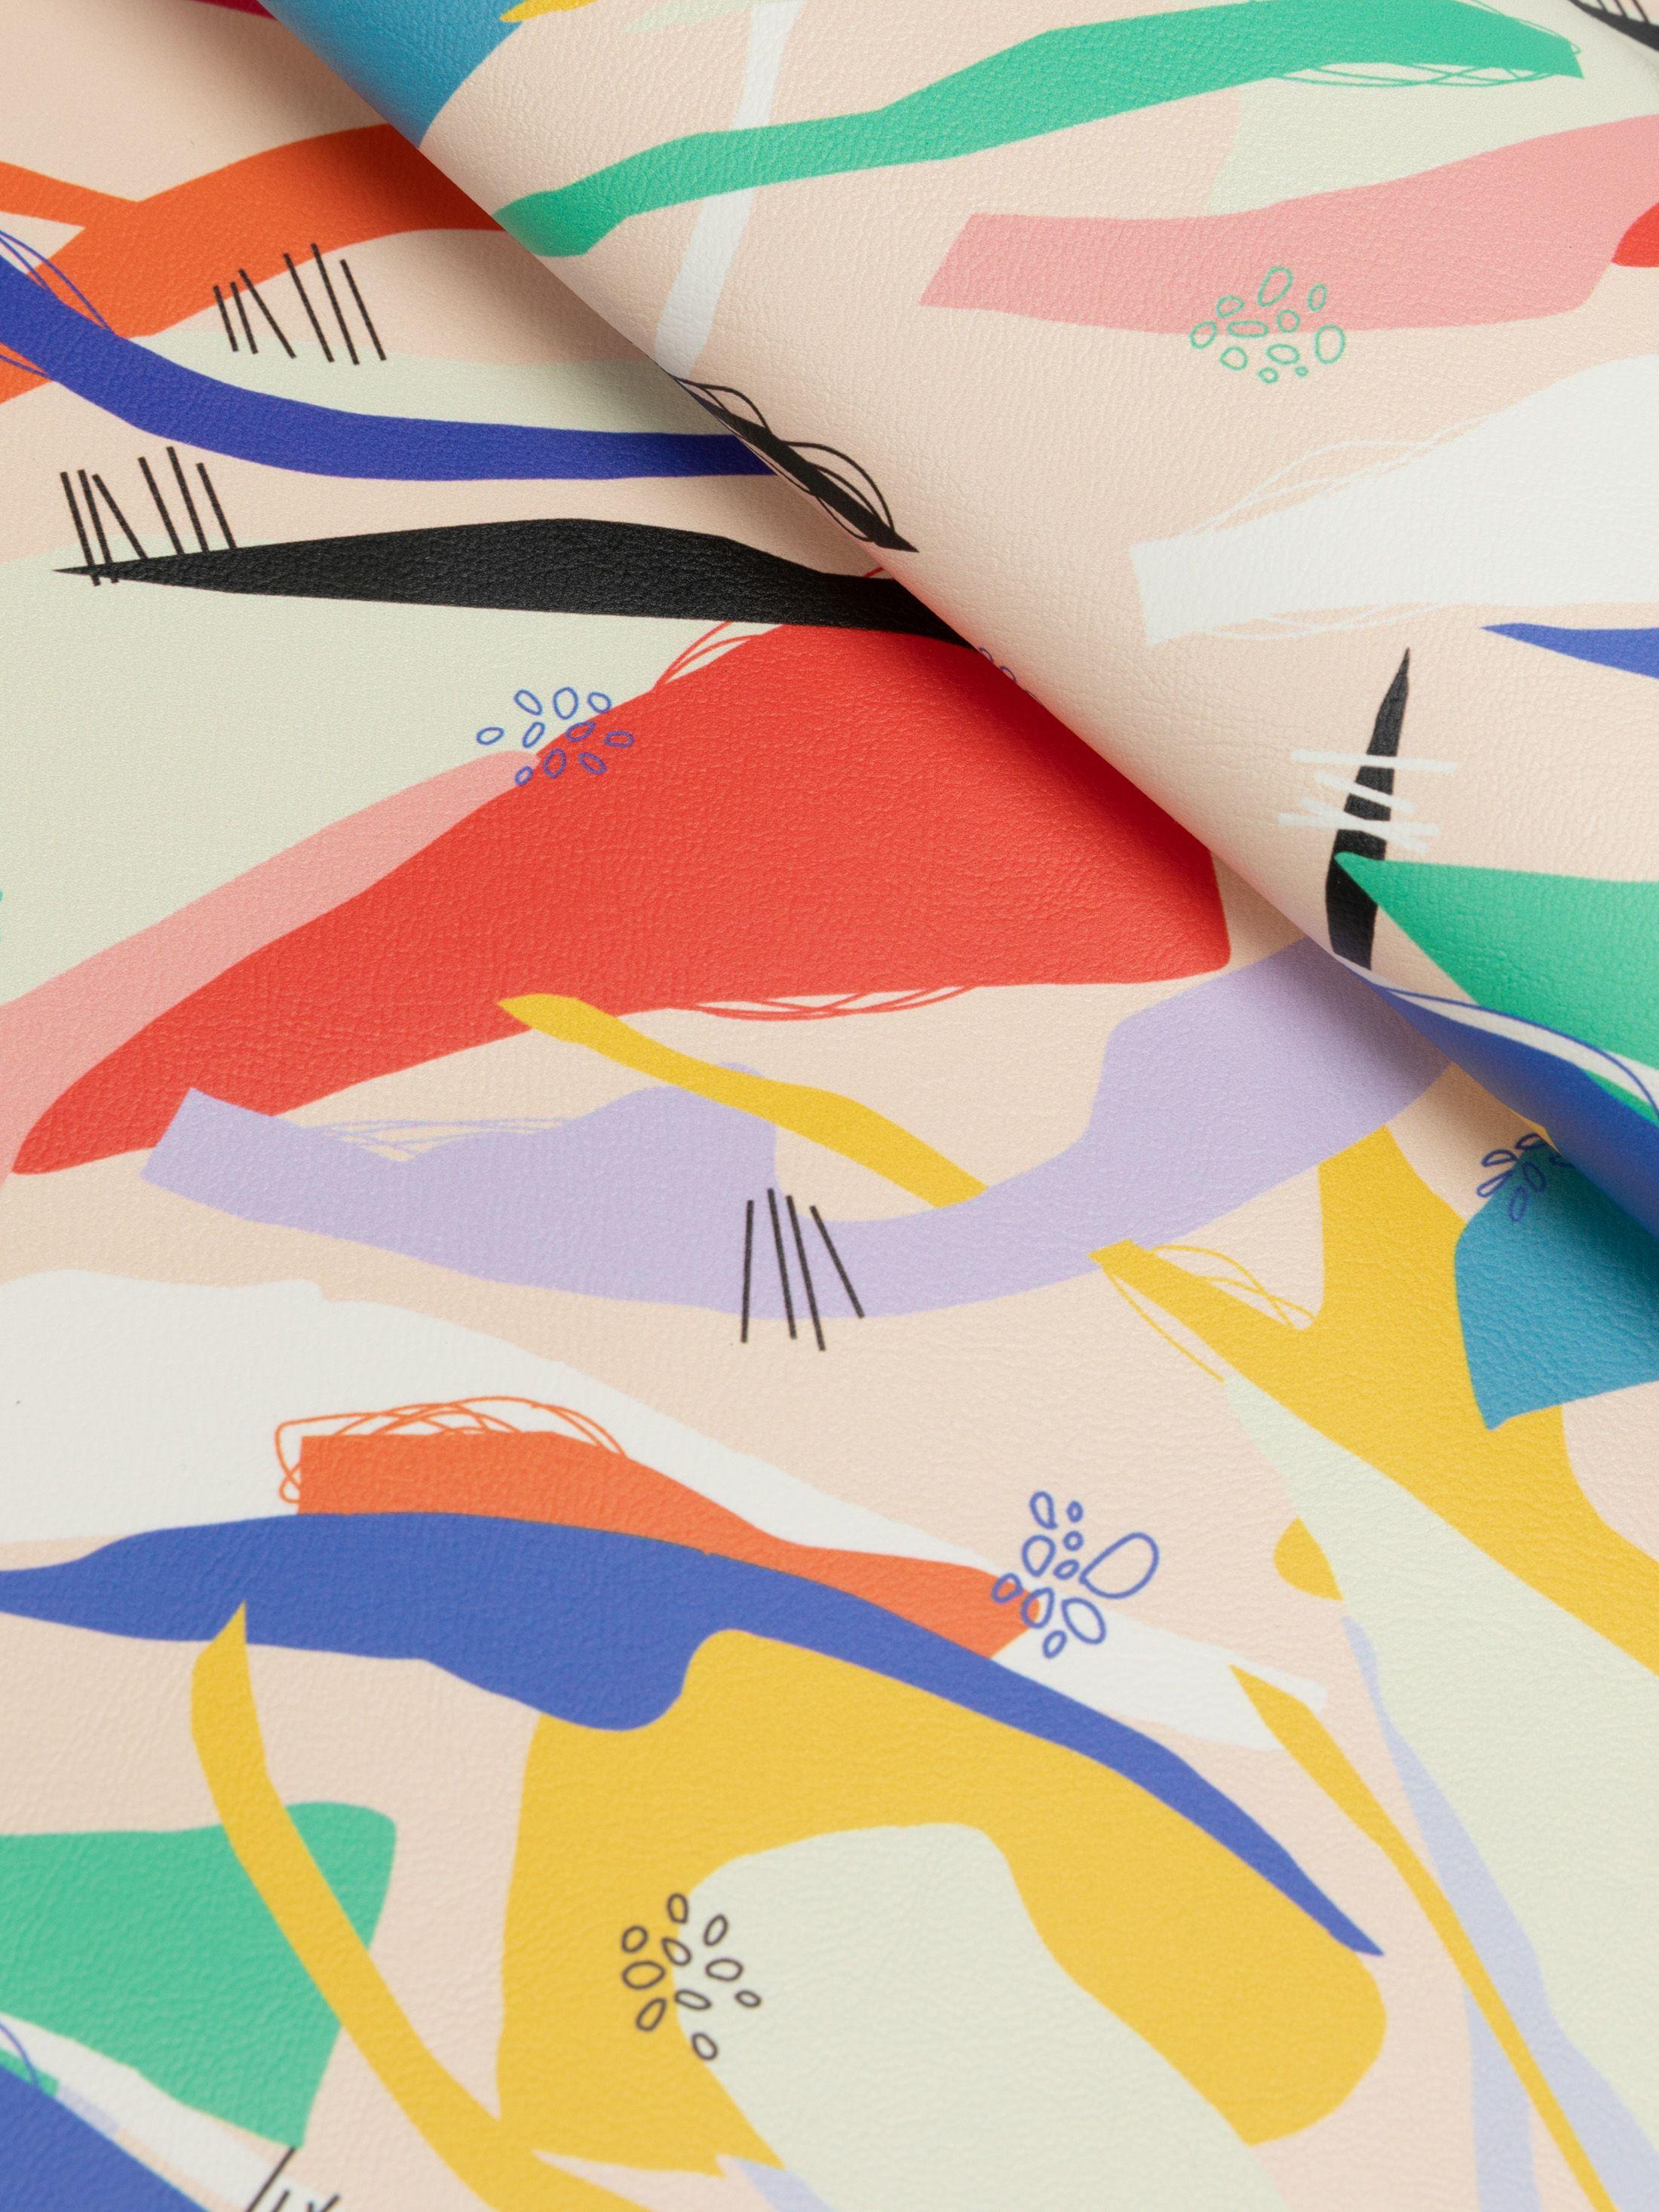 kunstleder für polster bedrucken